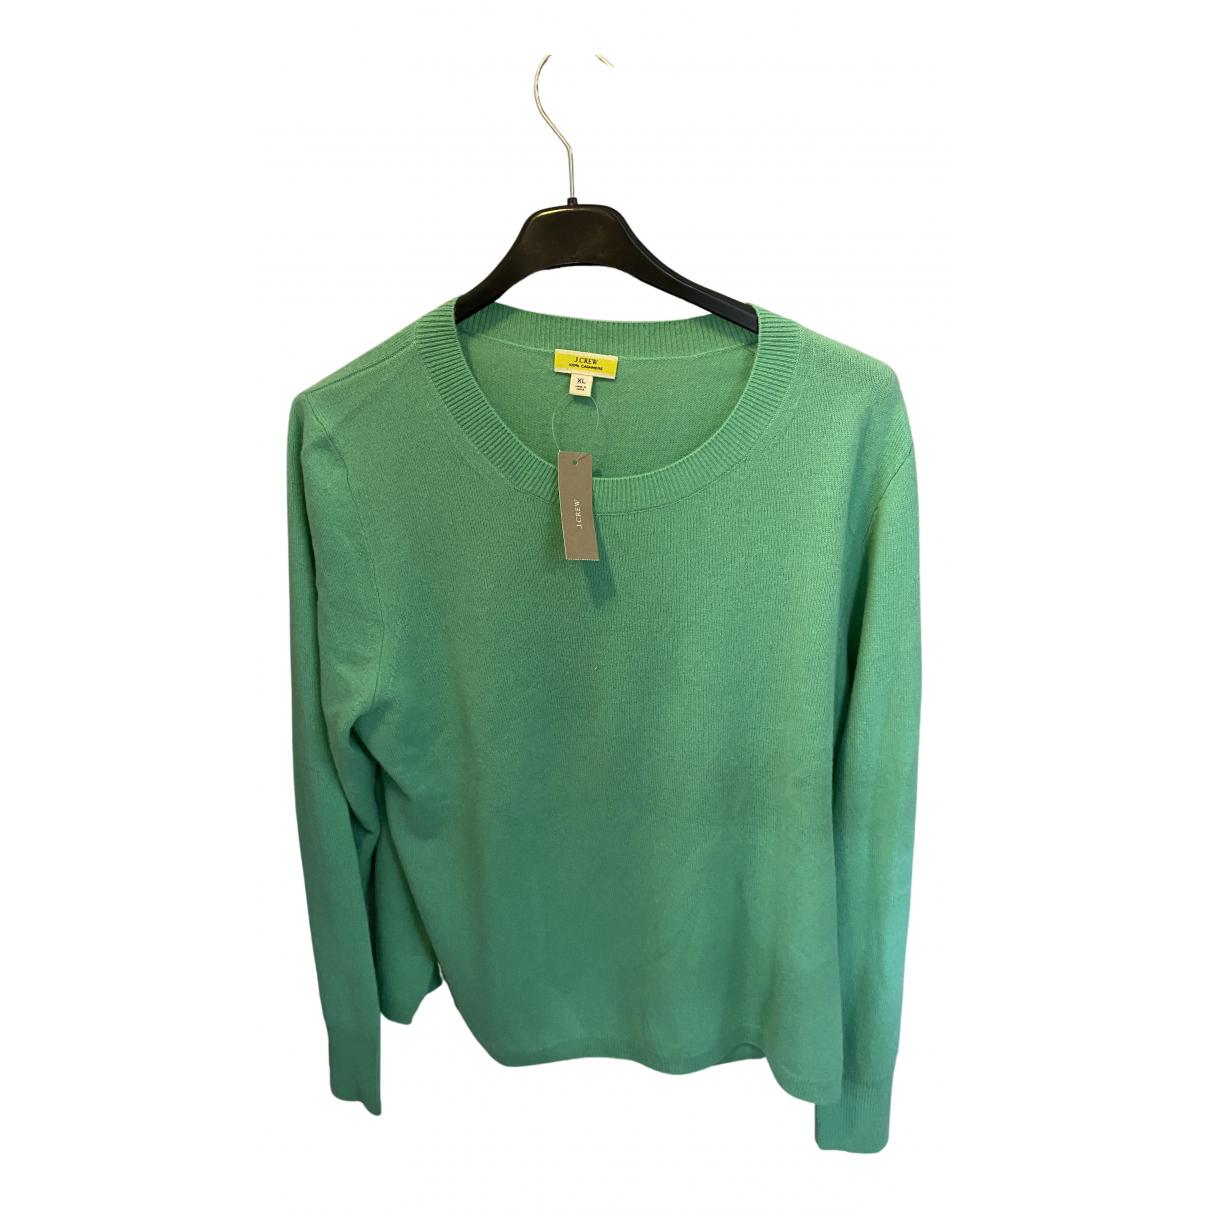 J.crew - Pull   pour femme en cachemire - vert